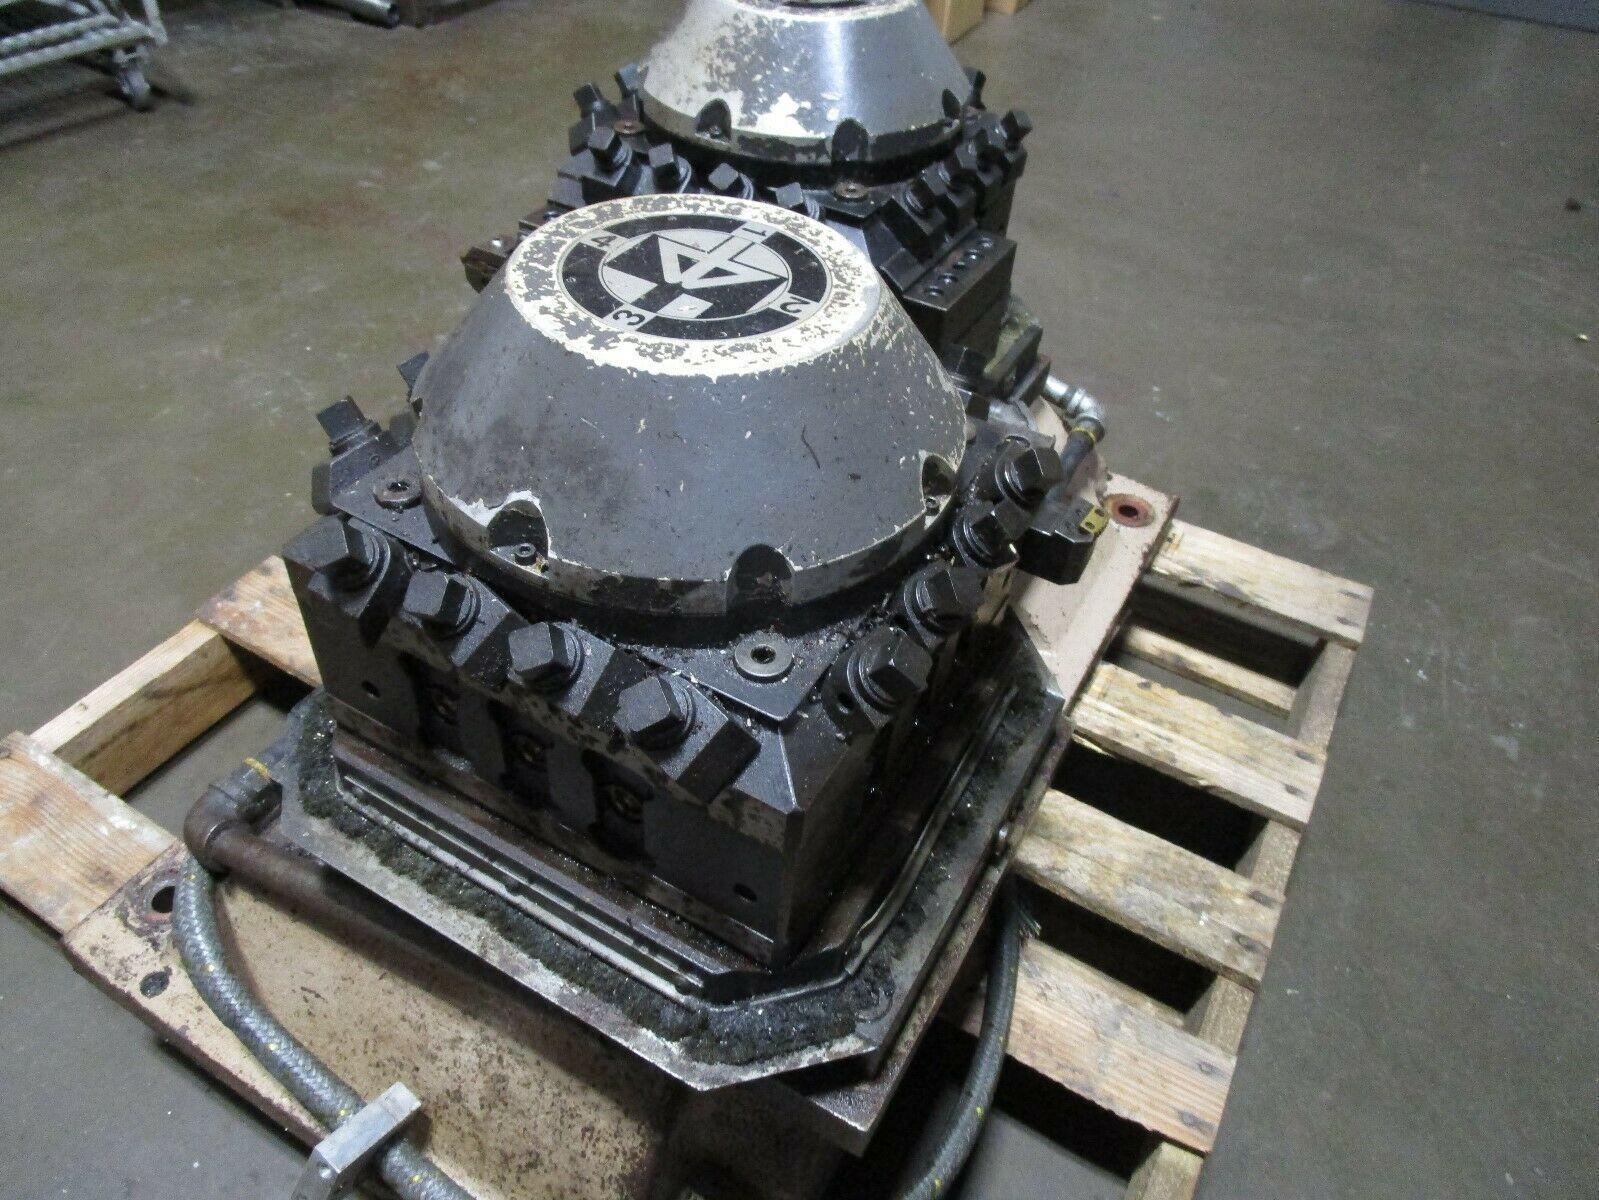 "4 Position Electric Turret for Lathe or VTL, Baruffaldi Heavy Duty 10-1/2"" Face"